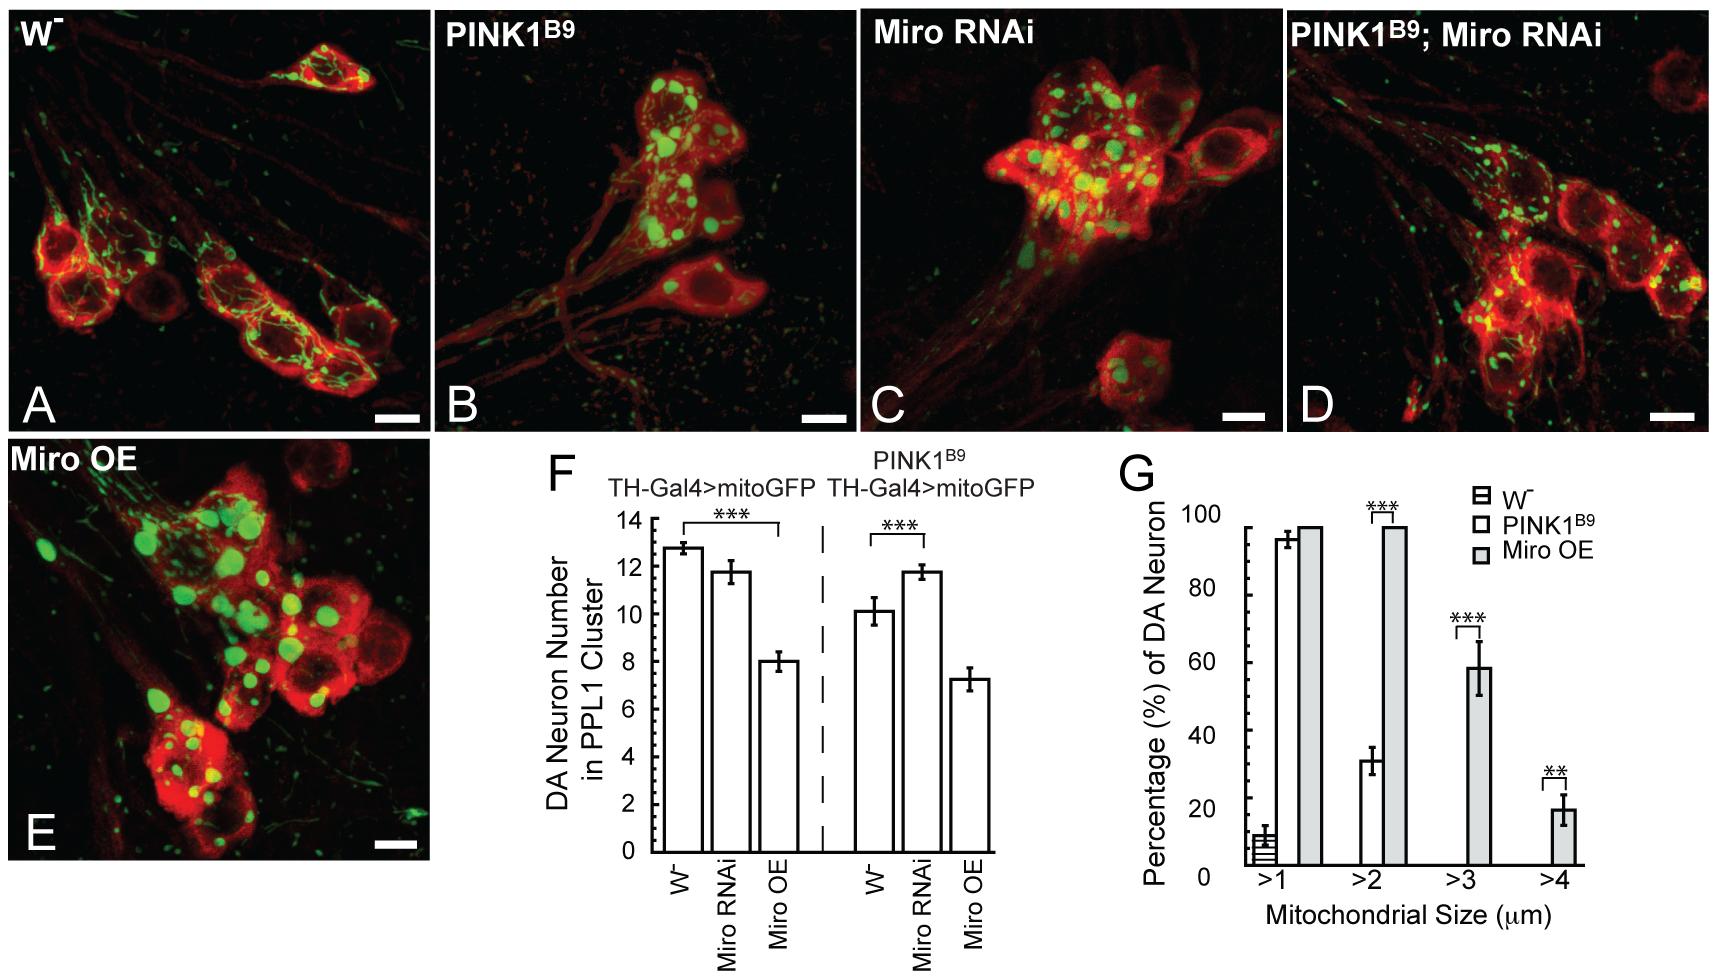 Genetic interaction between PINK1 and Miro in DA neurons.